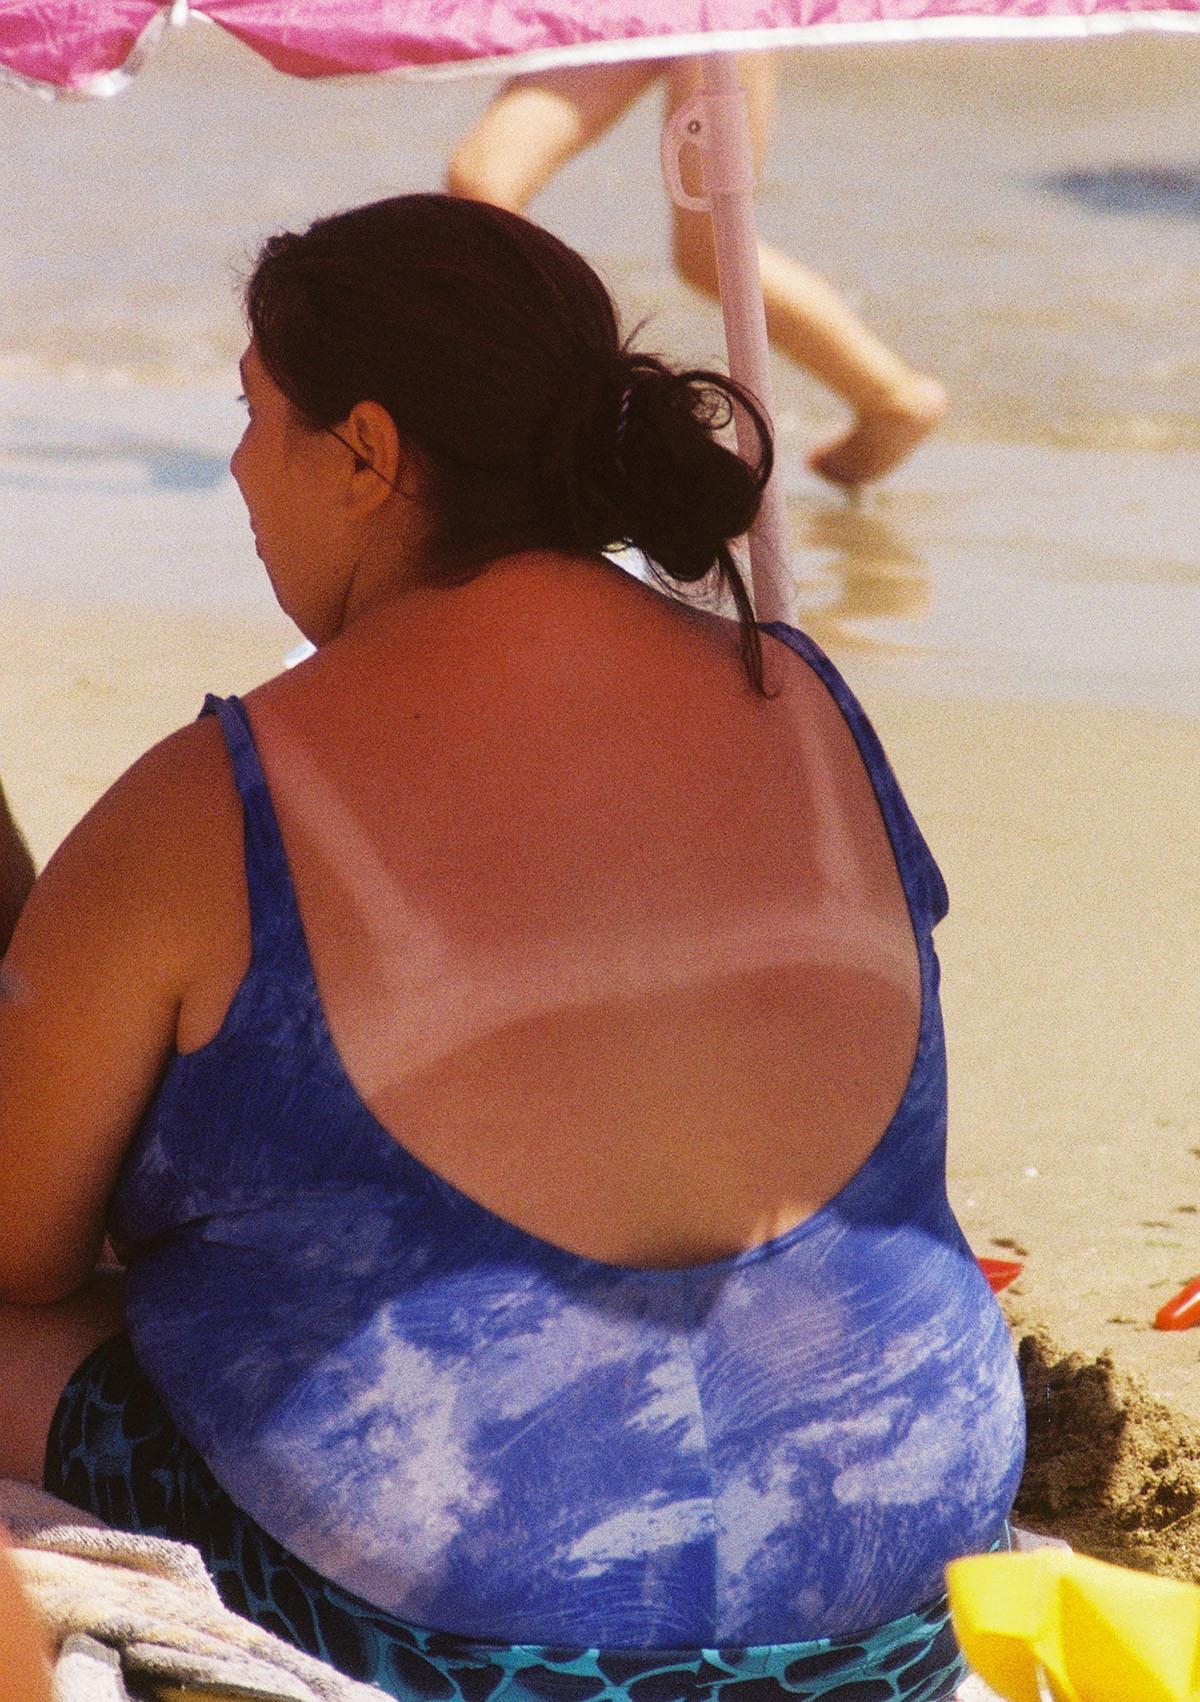 Denise Lobont, Woman on Eforie Sud Beach no. 2, 2021, © Denise Lobont